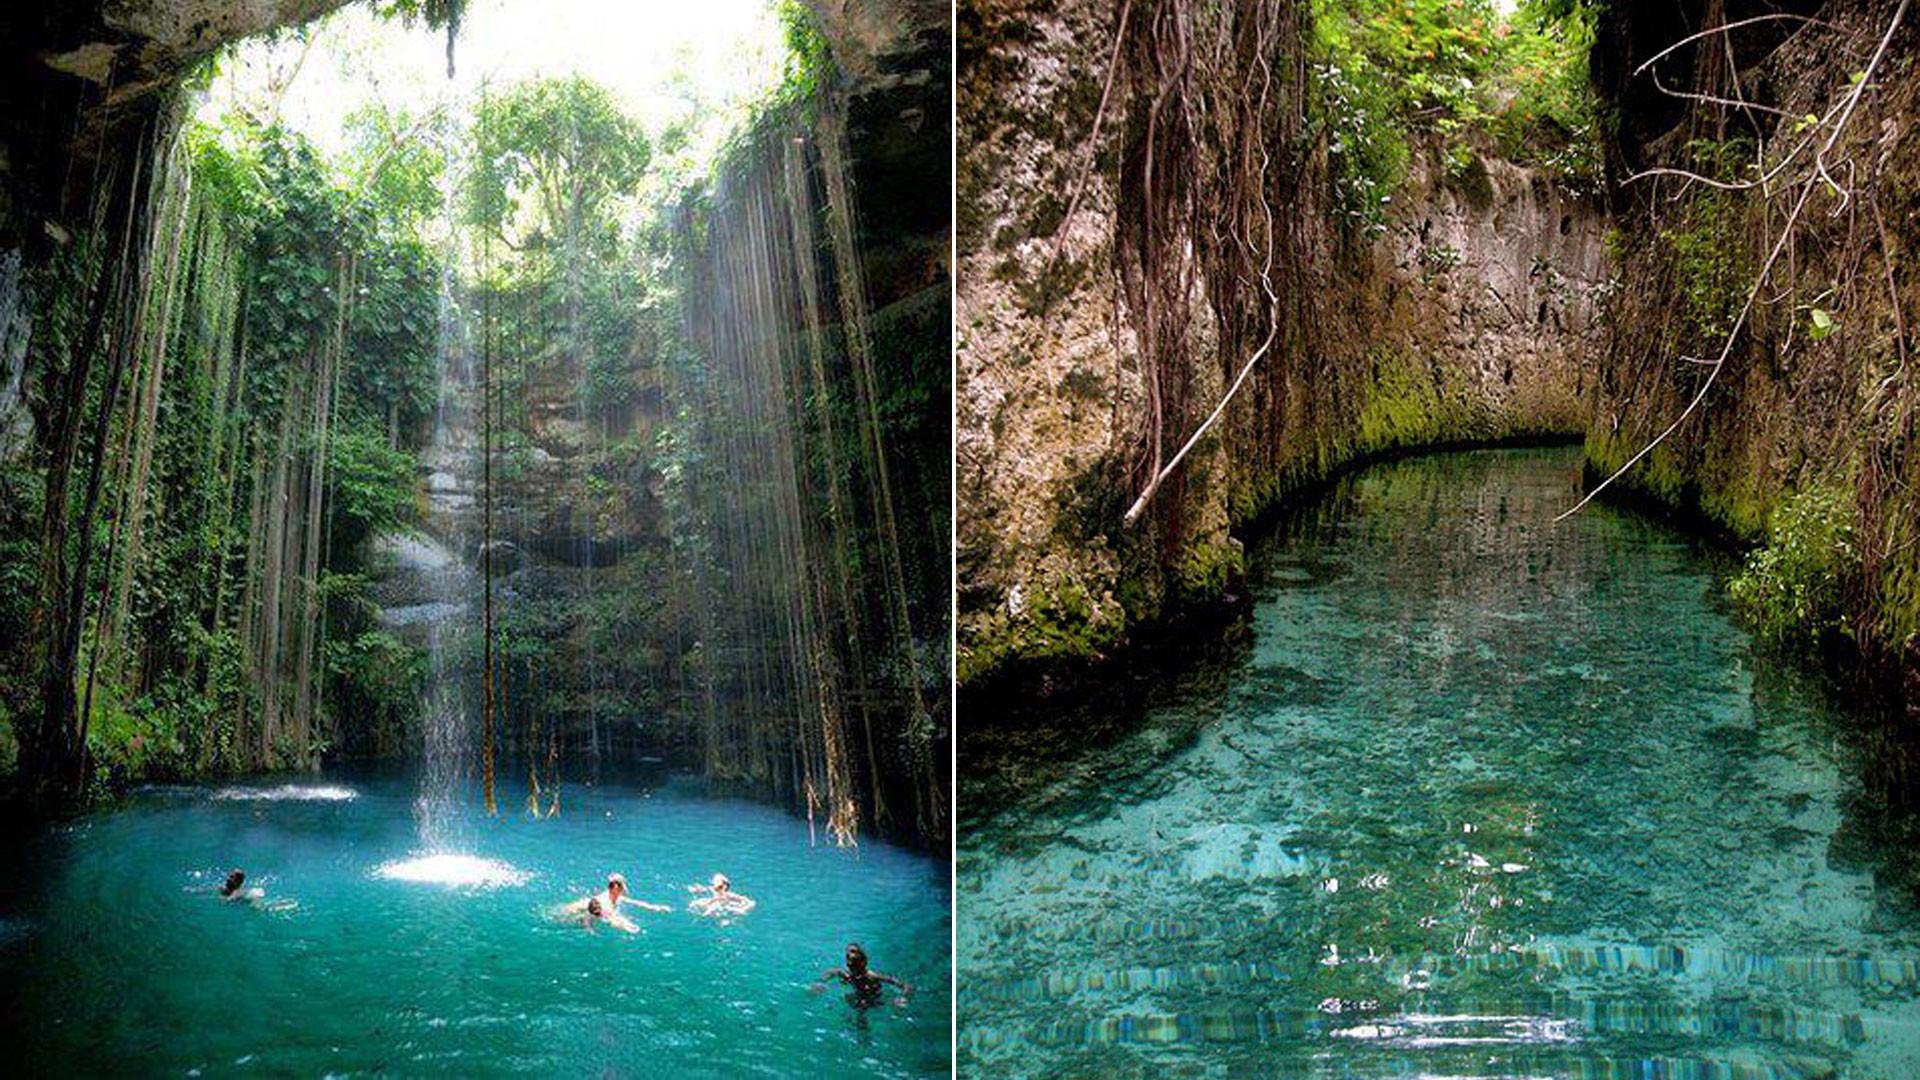 Underground Beach In Mexico | Underground Rivers Tourism, Mexico – Next  Trip Tourism